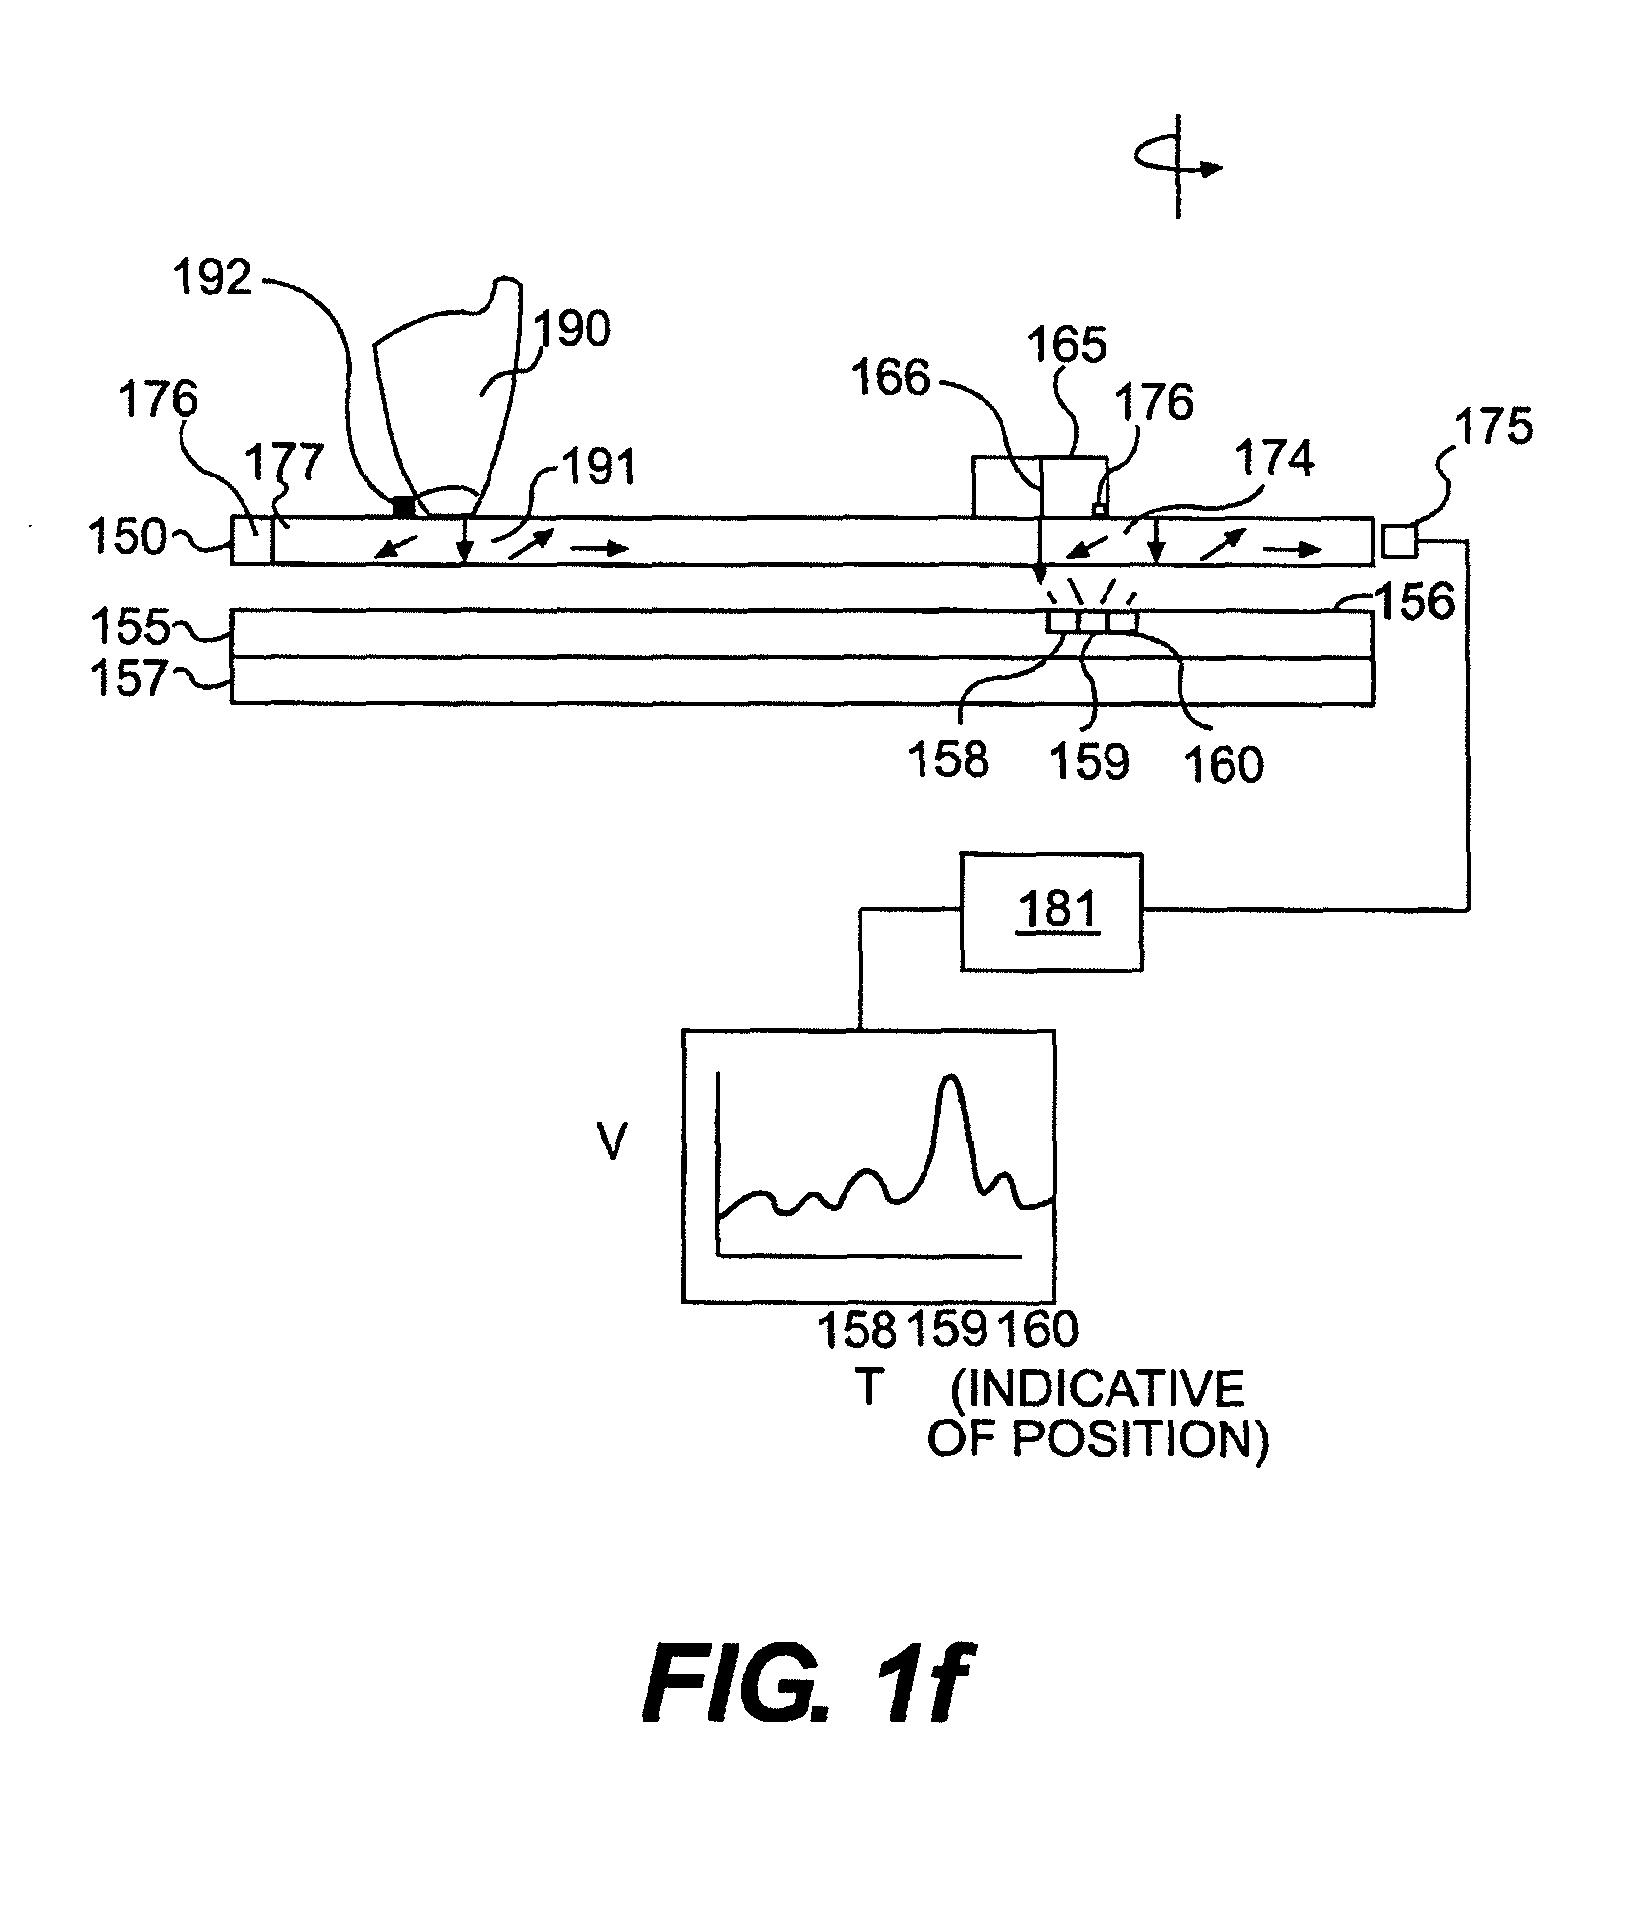 Federal Signal Siren Wiring Diagram As710. . Wiring Diagram on